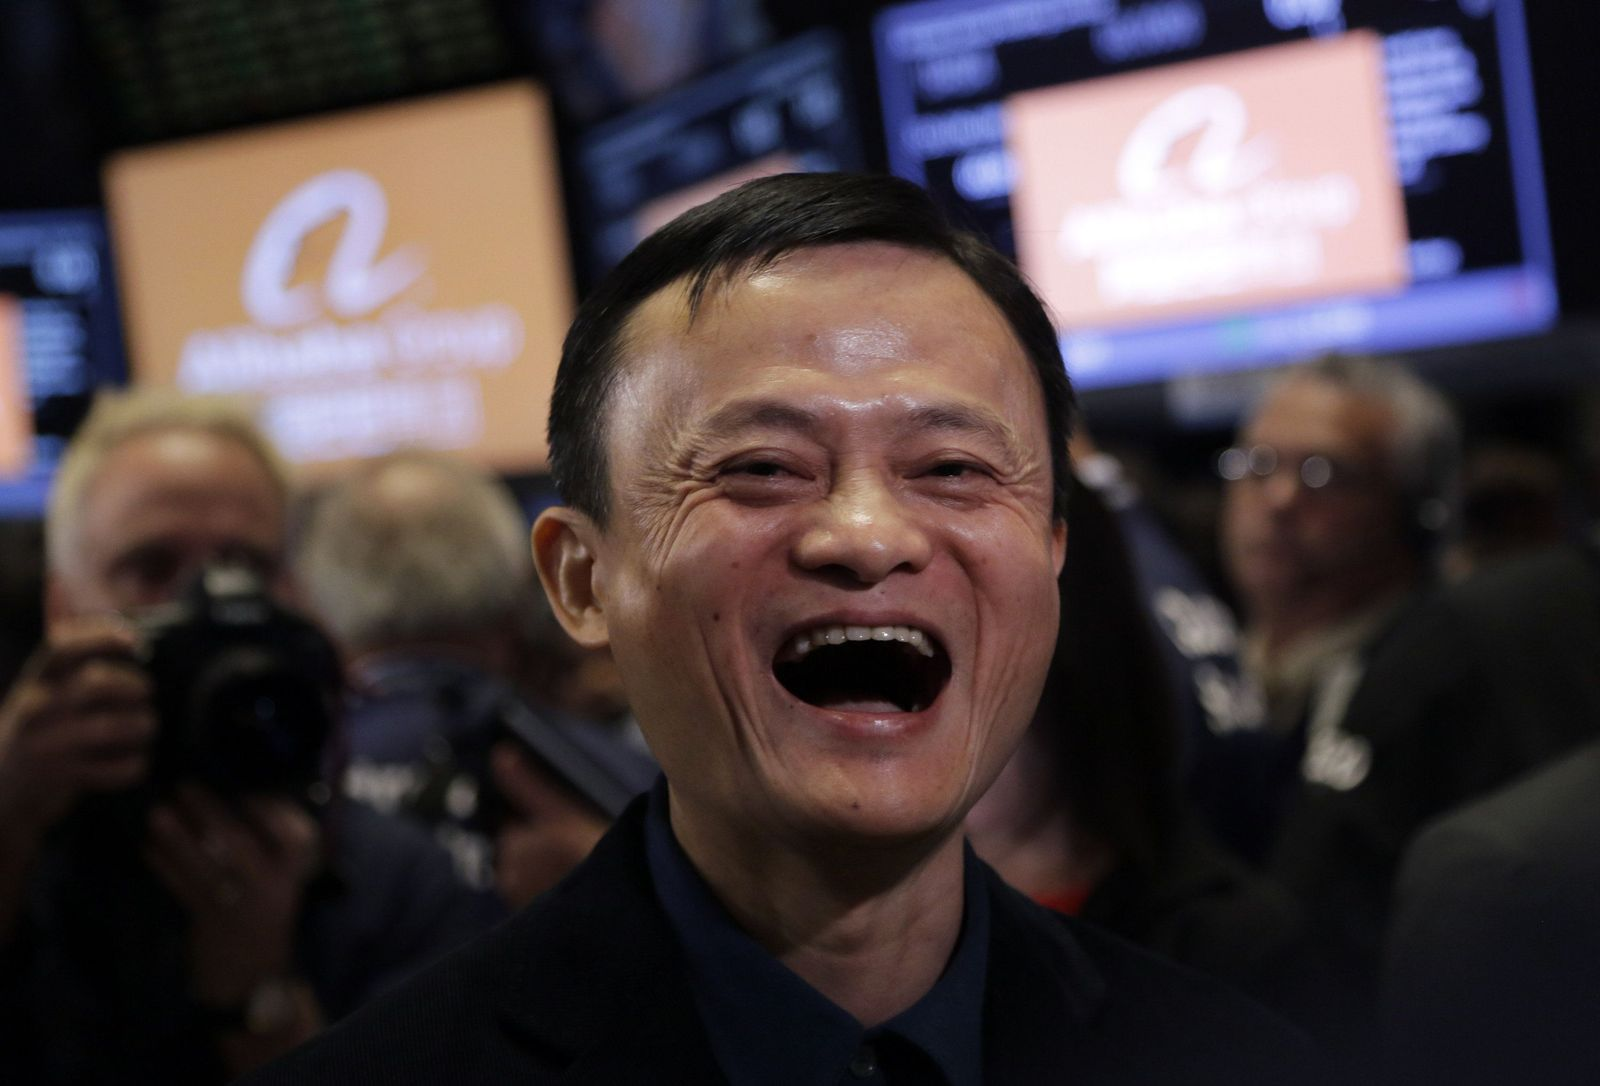 Jack Ma / Alibaba